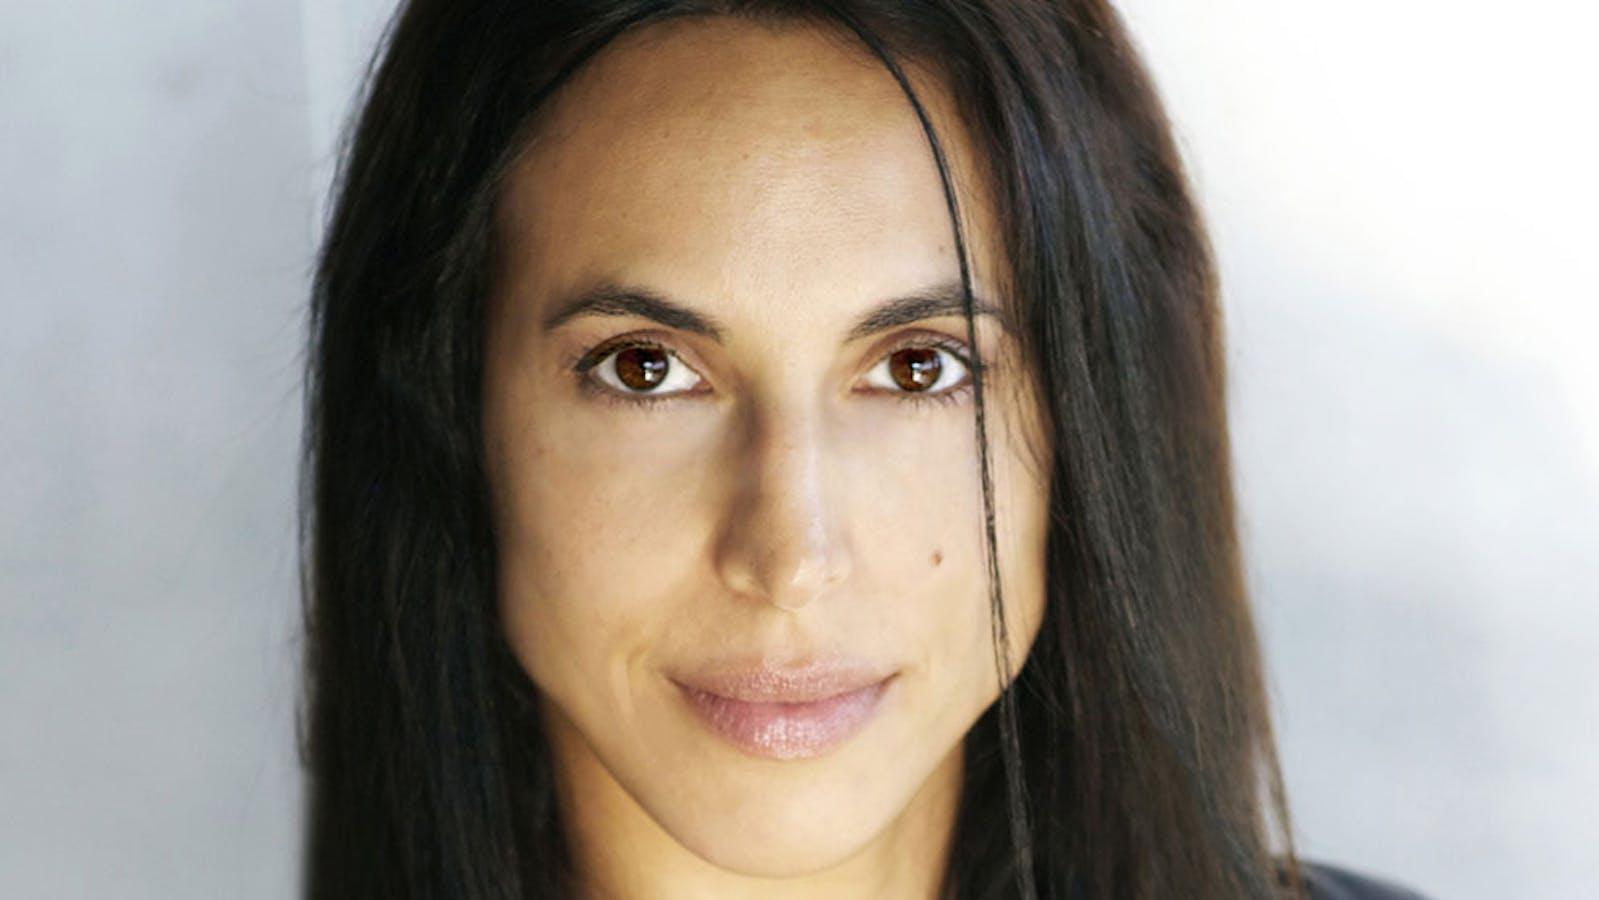 Alexandra Dalu